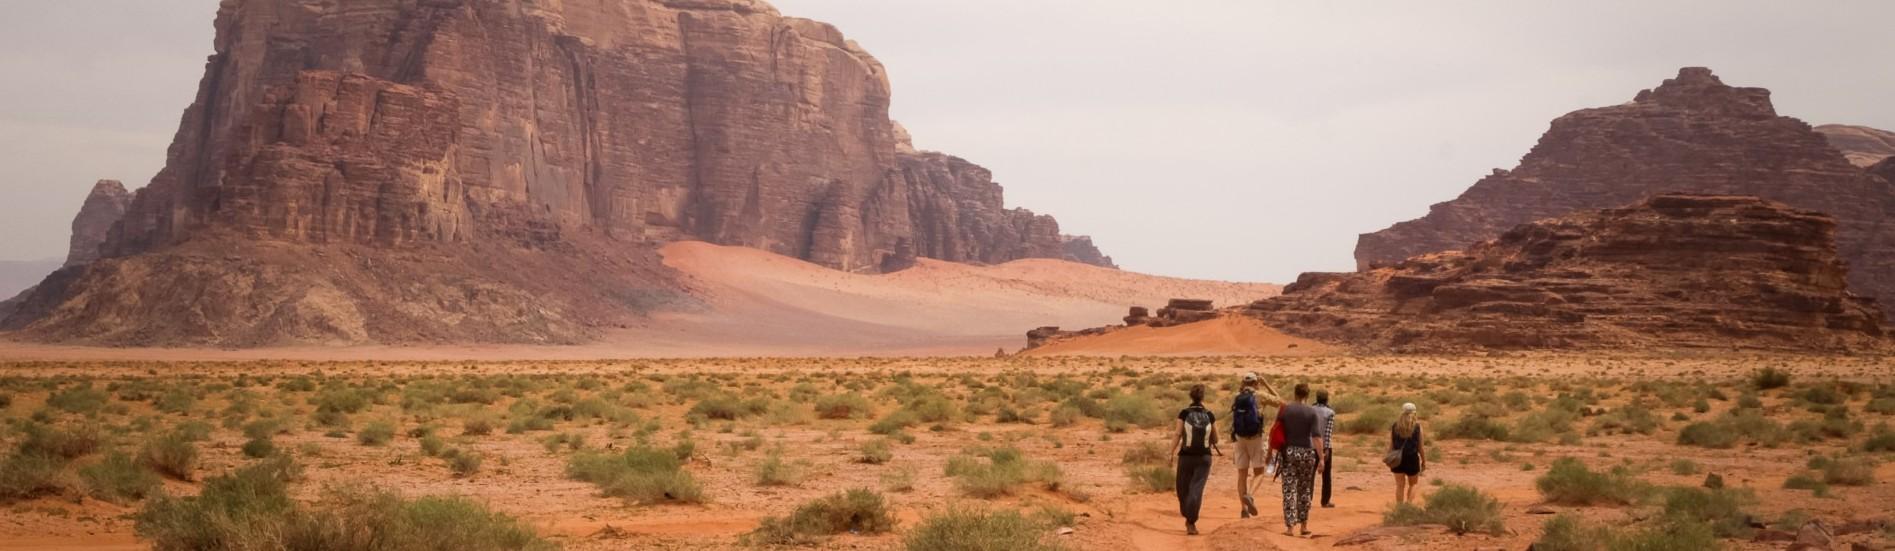 Workshop Mindfulness in Jordanie; Petra, Dana, Wadi Rum woestijn